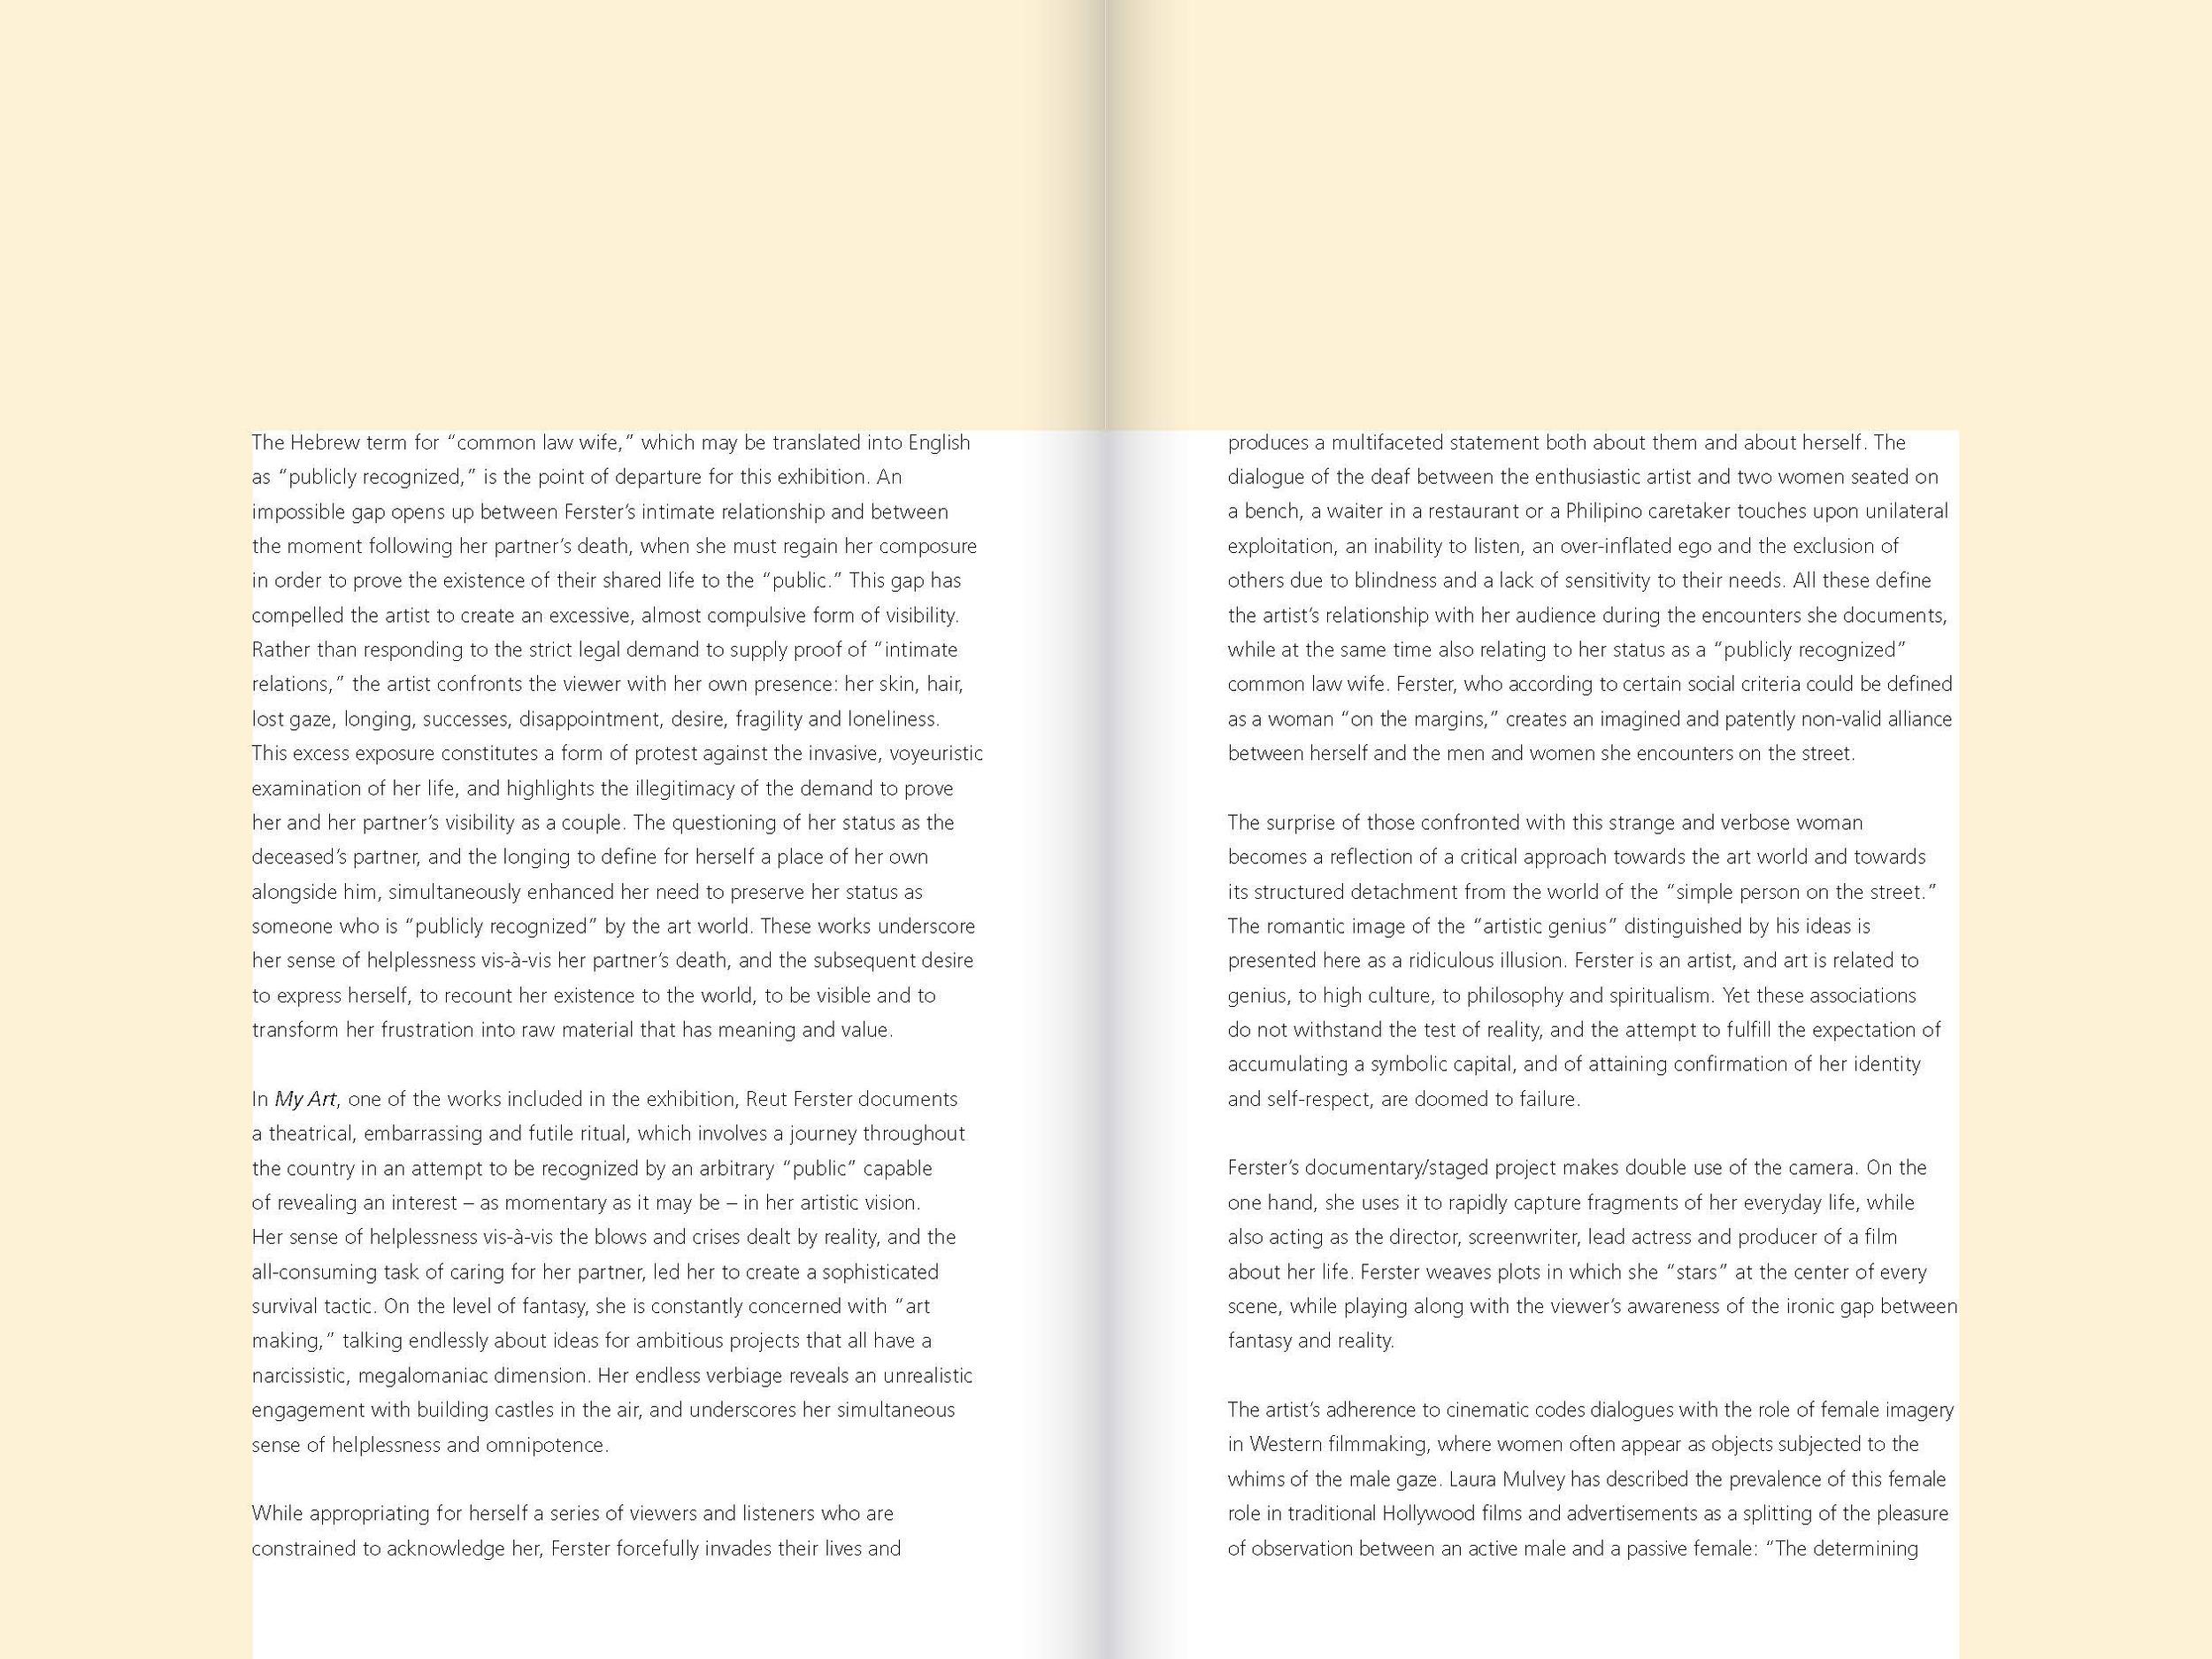 reut_ferster catalouge_Page_15.jpg